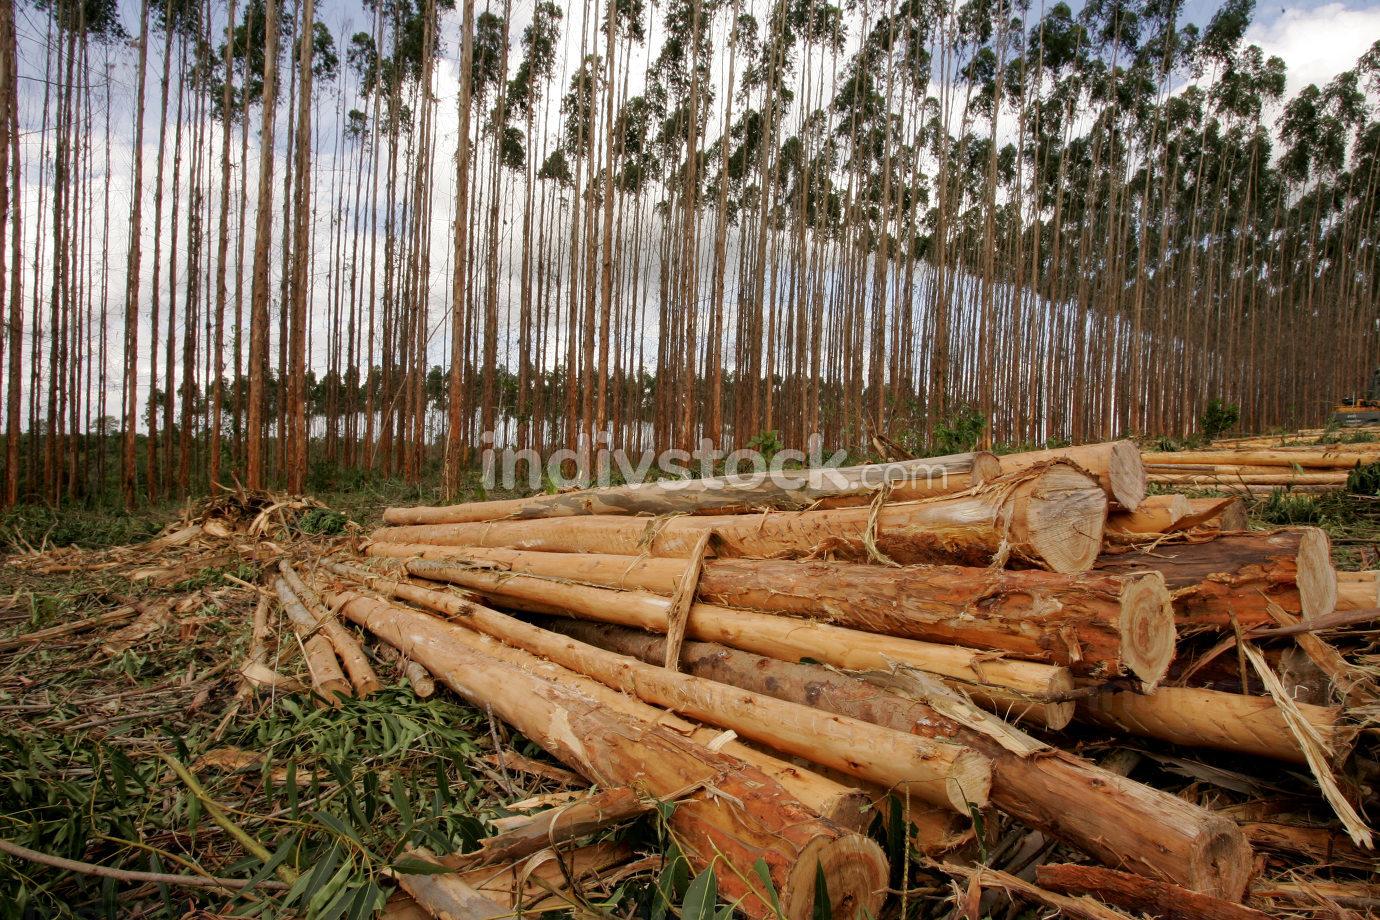 eunapolis, bahia Brazil, november 26, 2010, planting of eucalyptus trees for pulp production in a factory